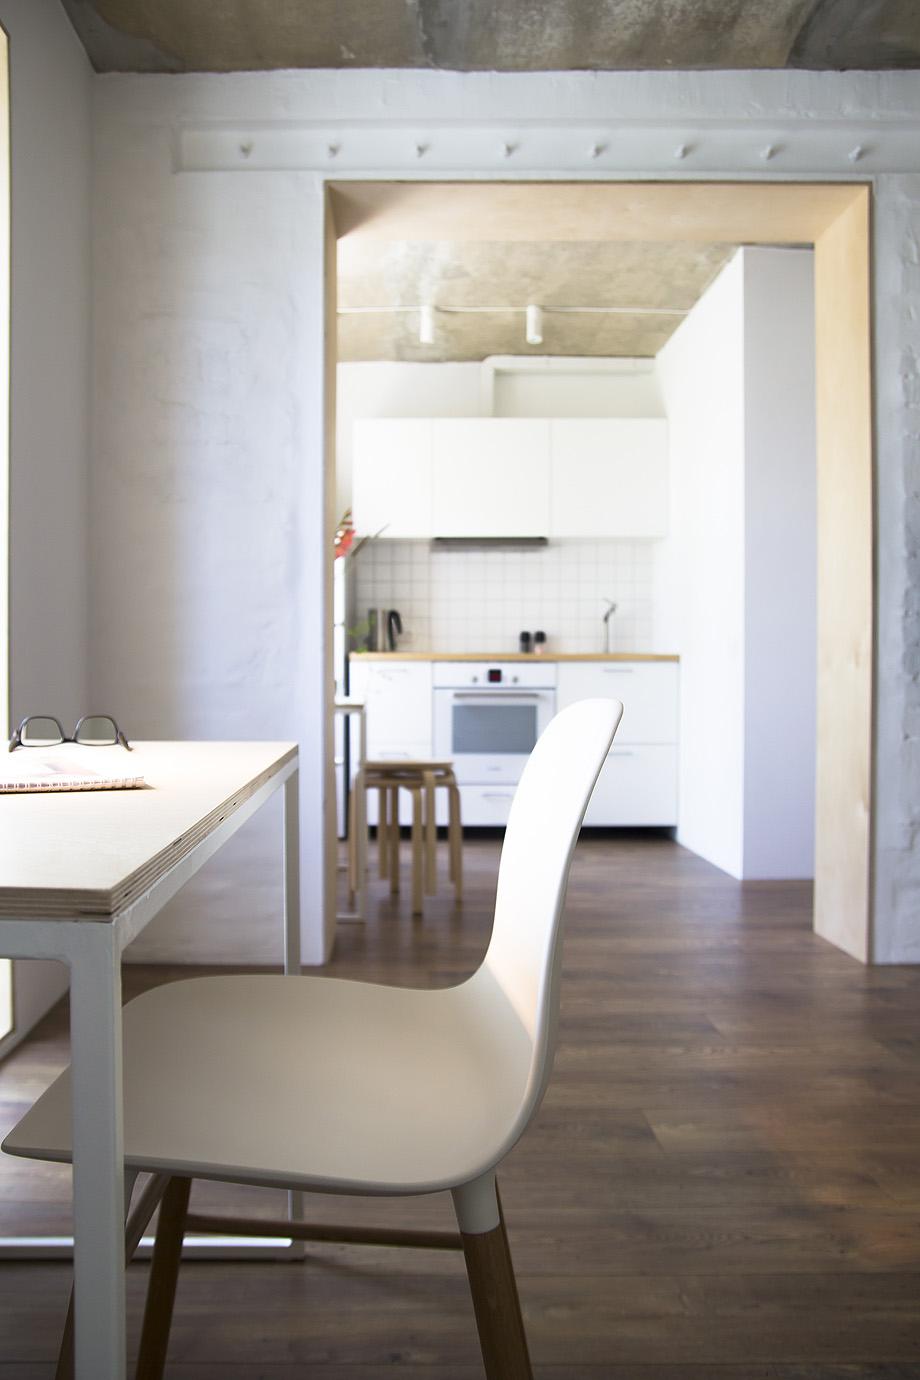 apartamento en rusia por kdva architects - foto daria koloskova (25)